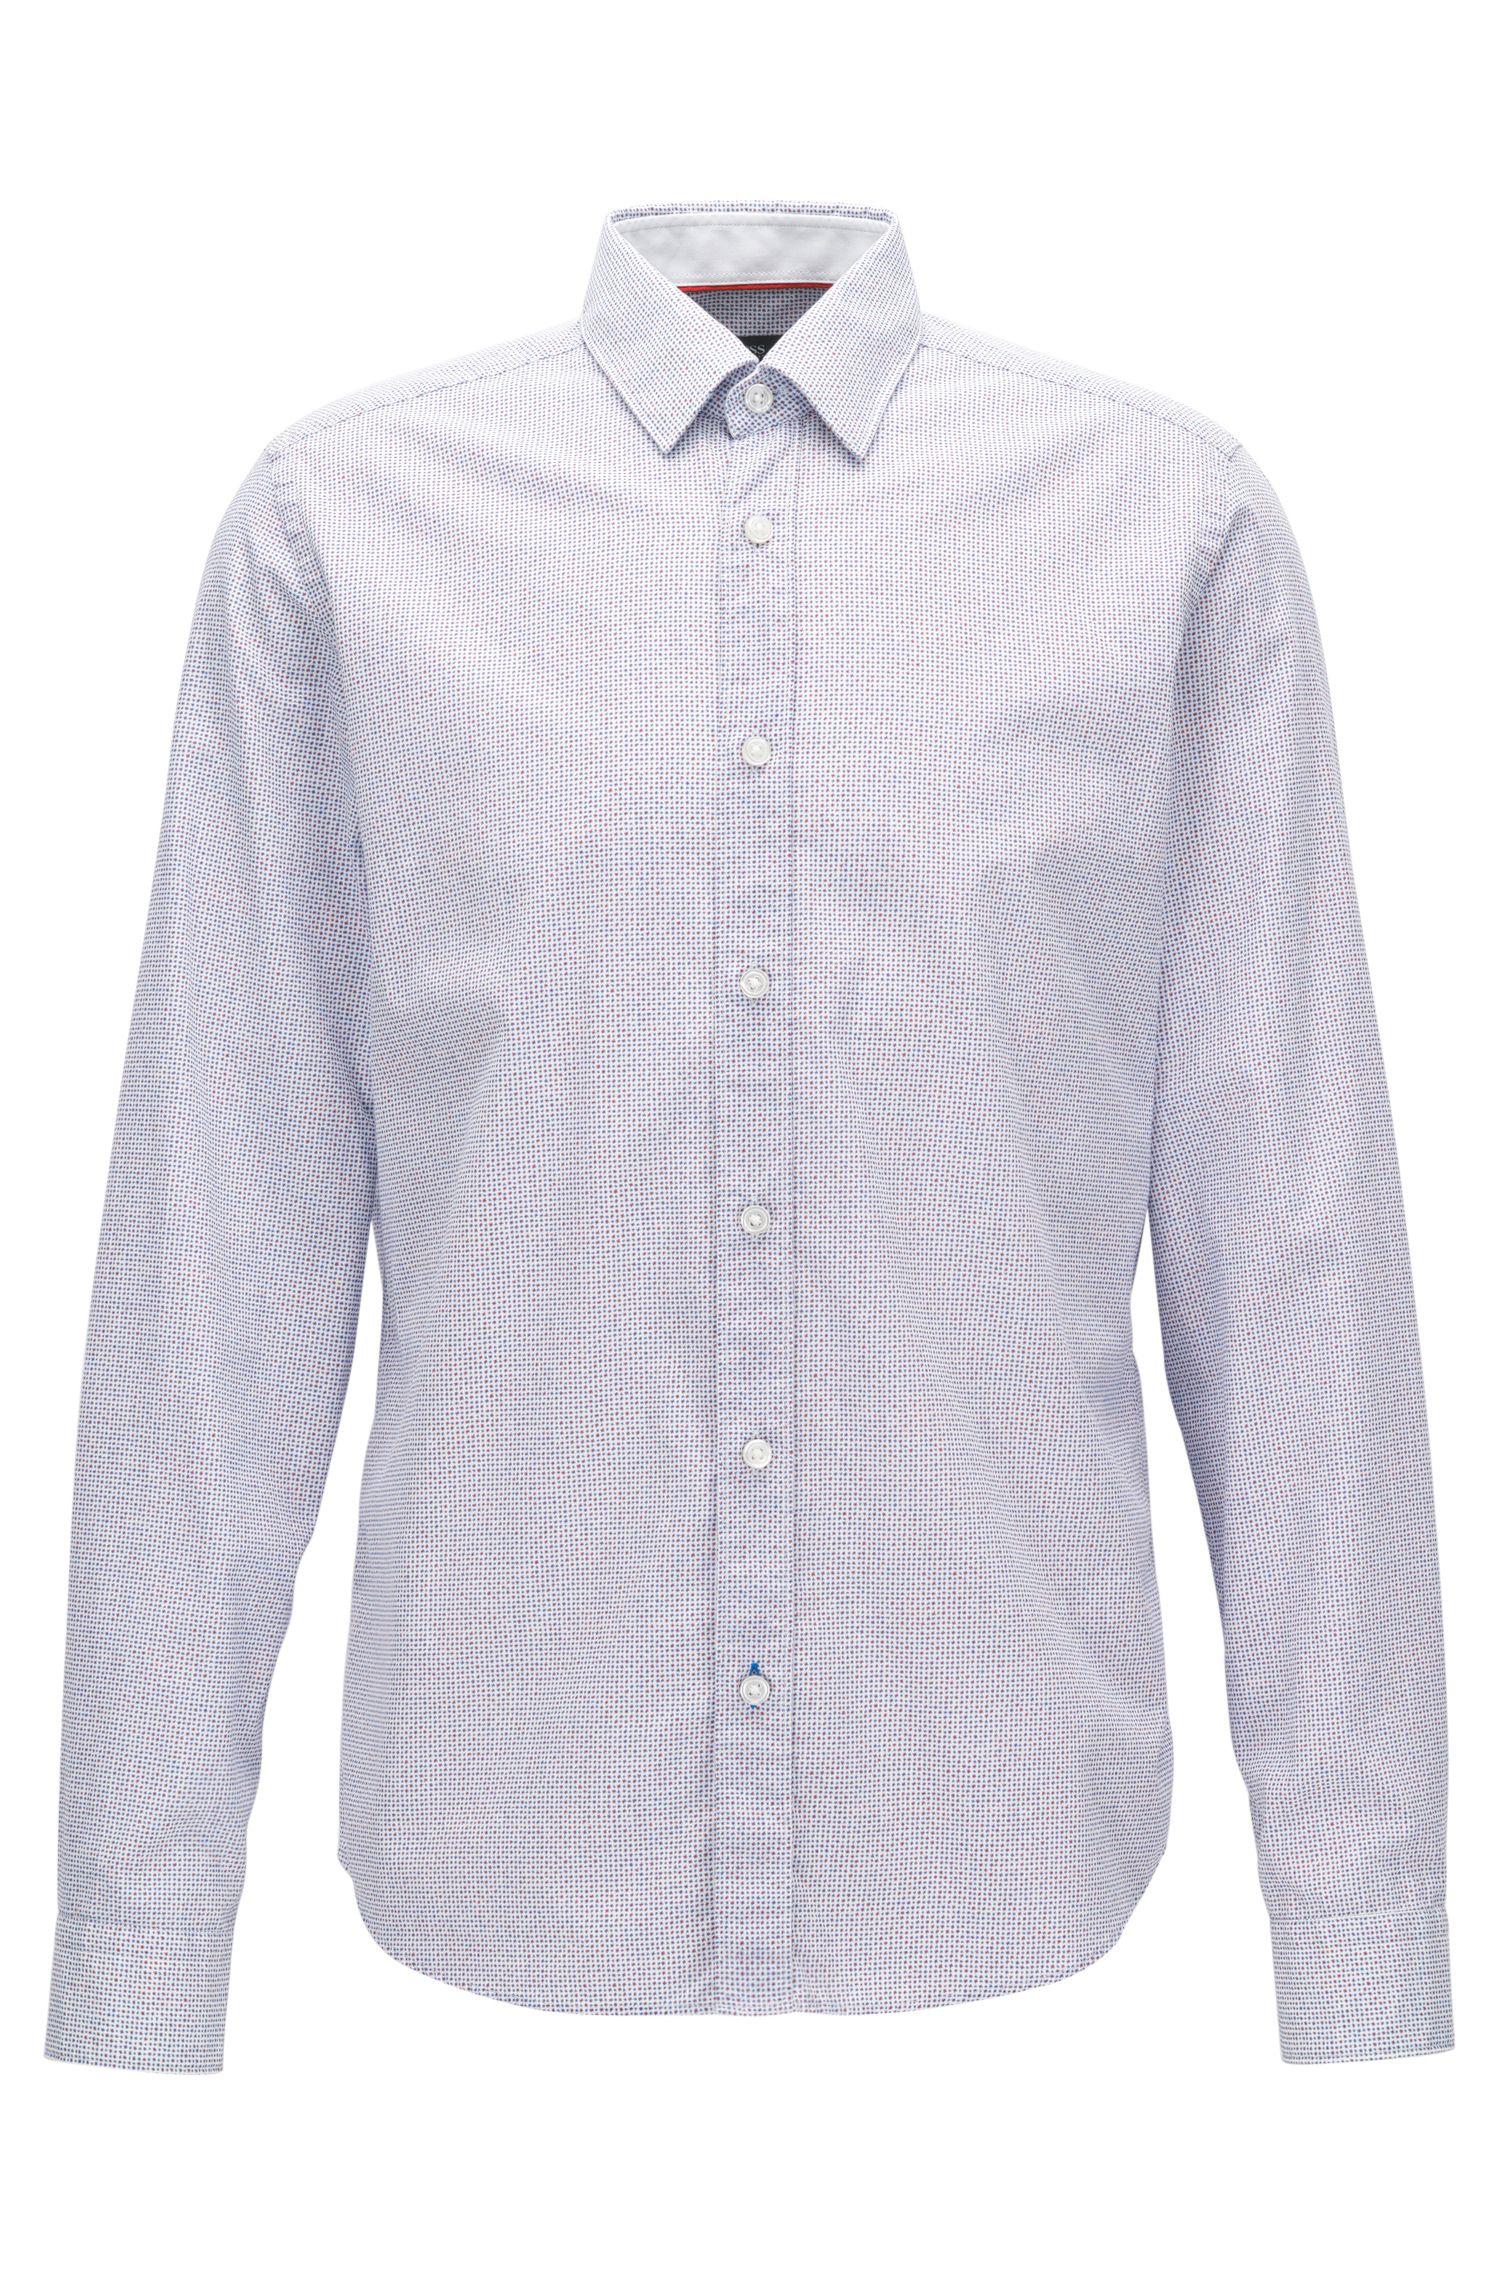 Fein bedrucktes Regular-Fit Hemd aus Baumwolle